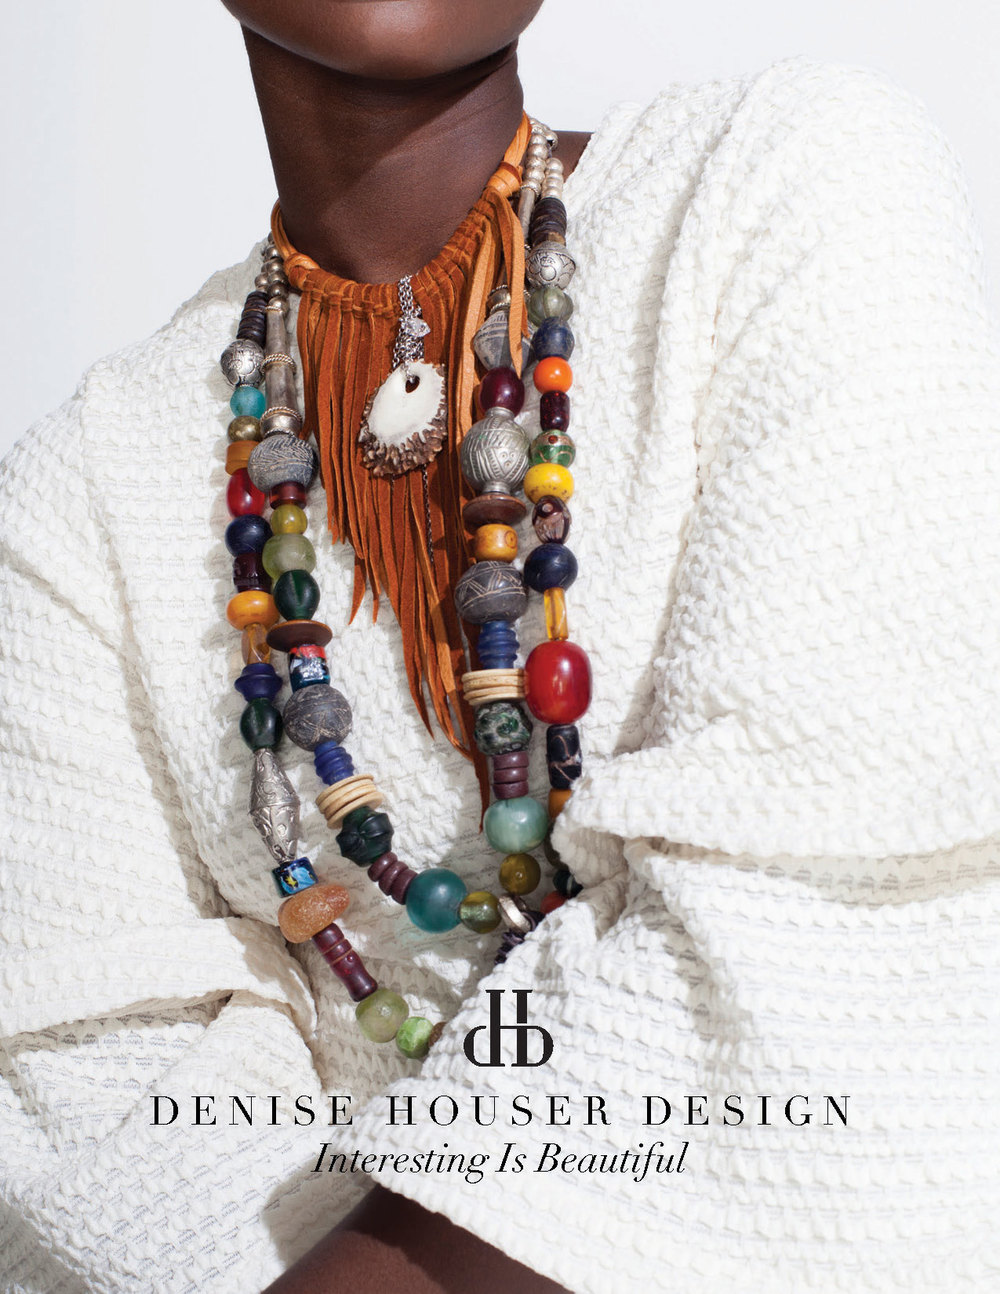 Denise_Houser_Design_Lookbook_Page_1_alt.jpg